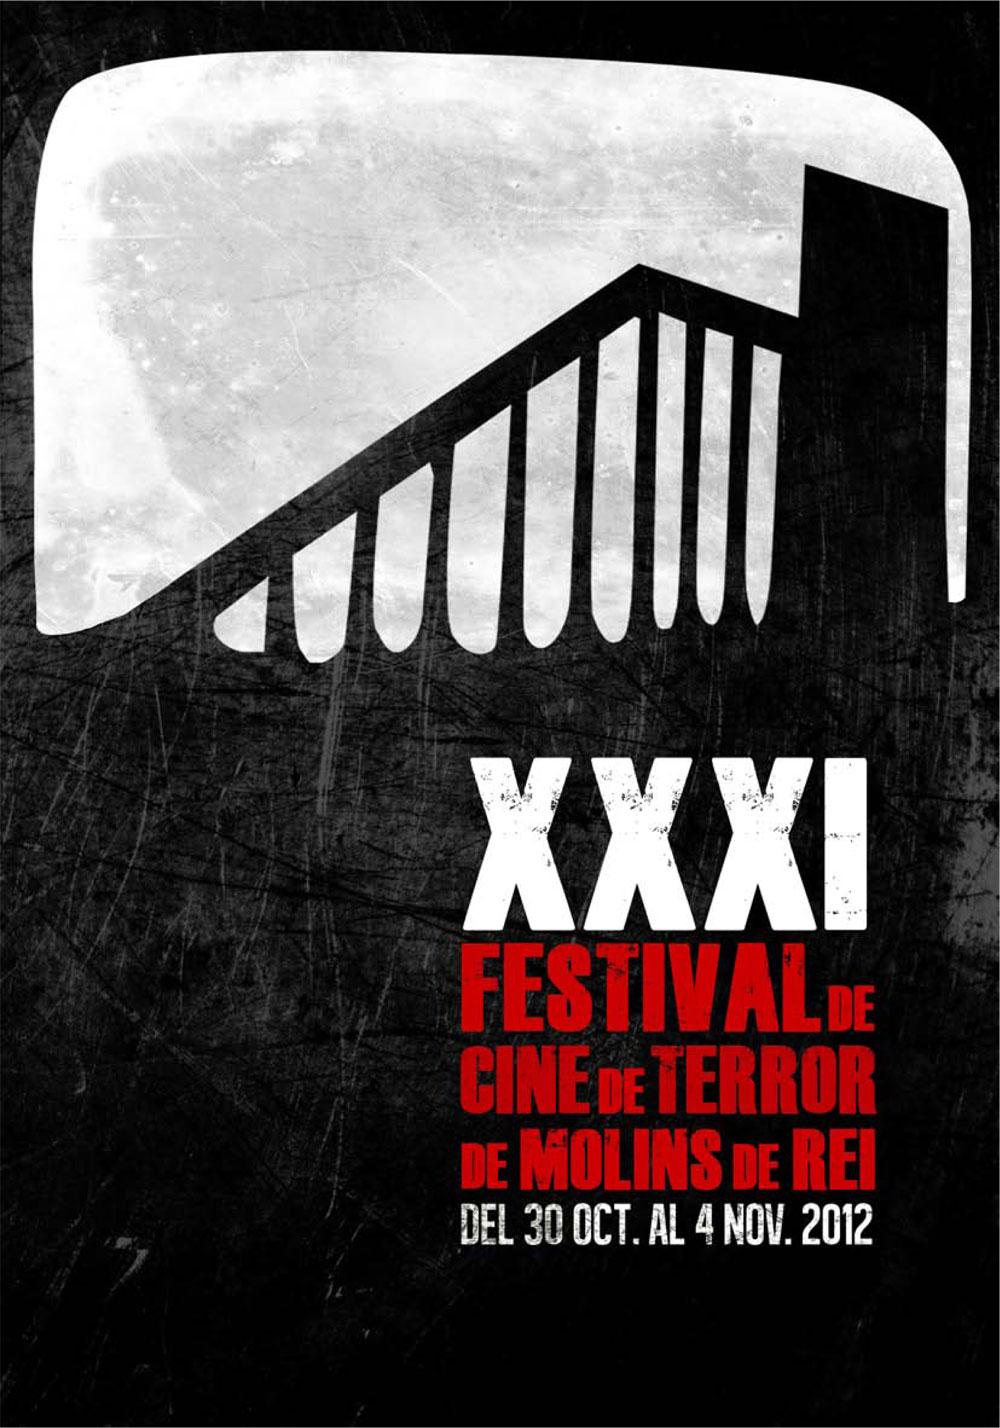 XXXI Festival de cine de terror de Molins de Rei